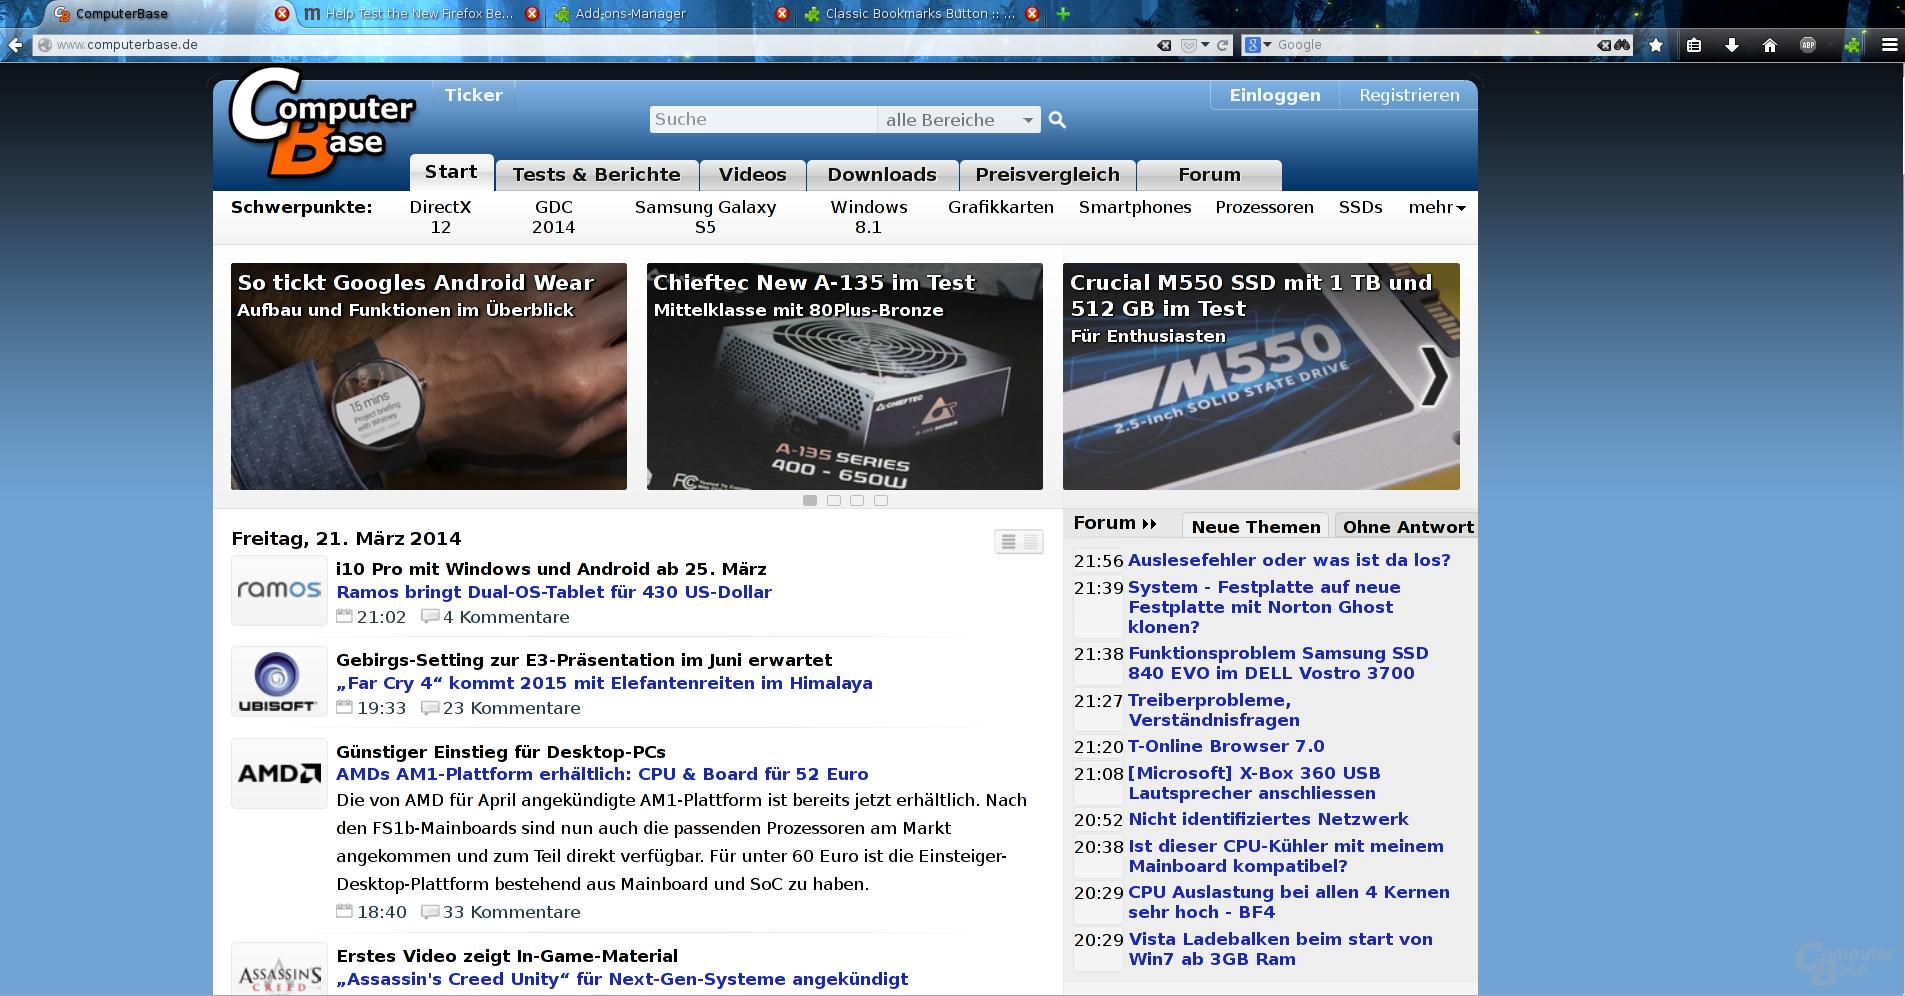 Firefox 29 Beta